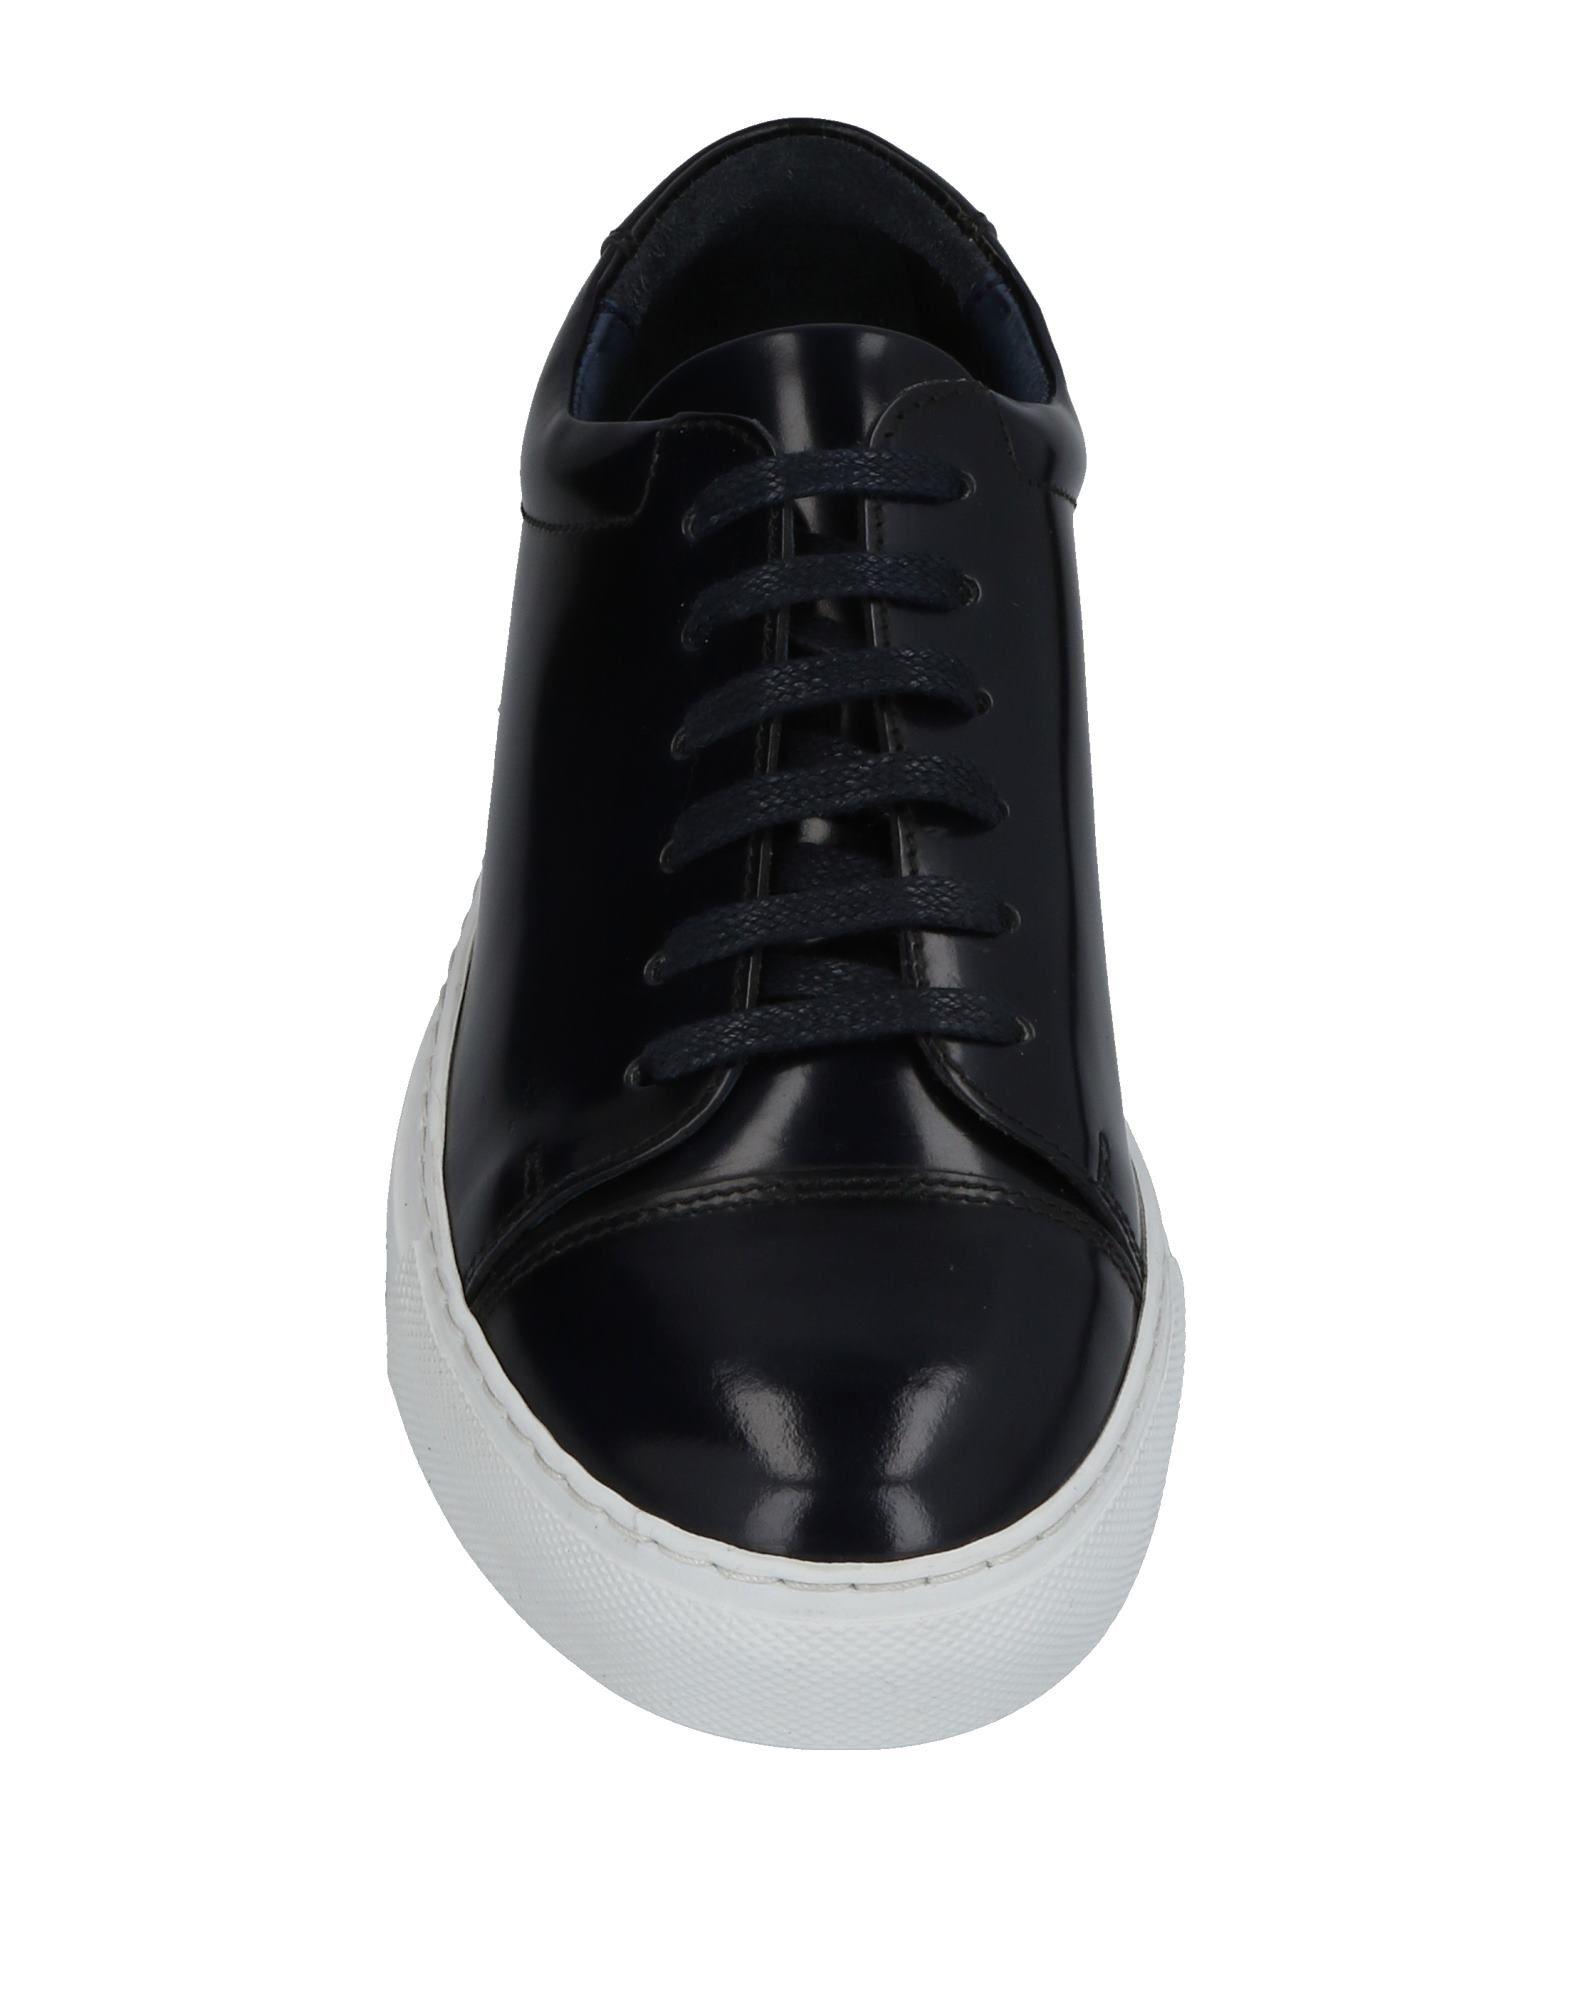 Gut um billige Schuhe zu 11448791CV tragenMackintosh Sneakers Damen  11448791CV zu 7b3e3f